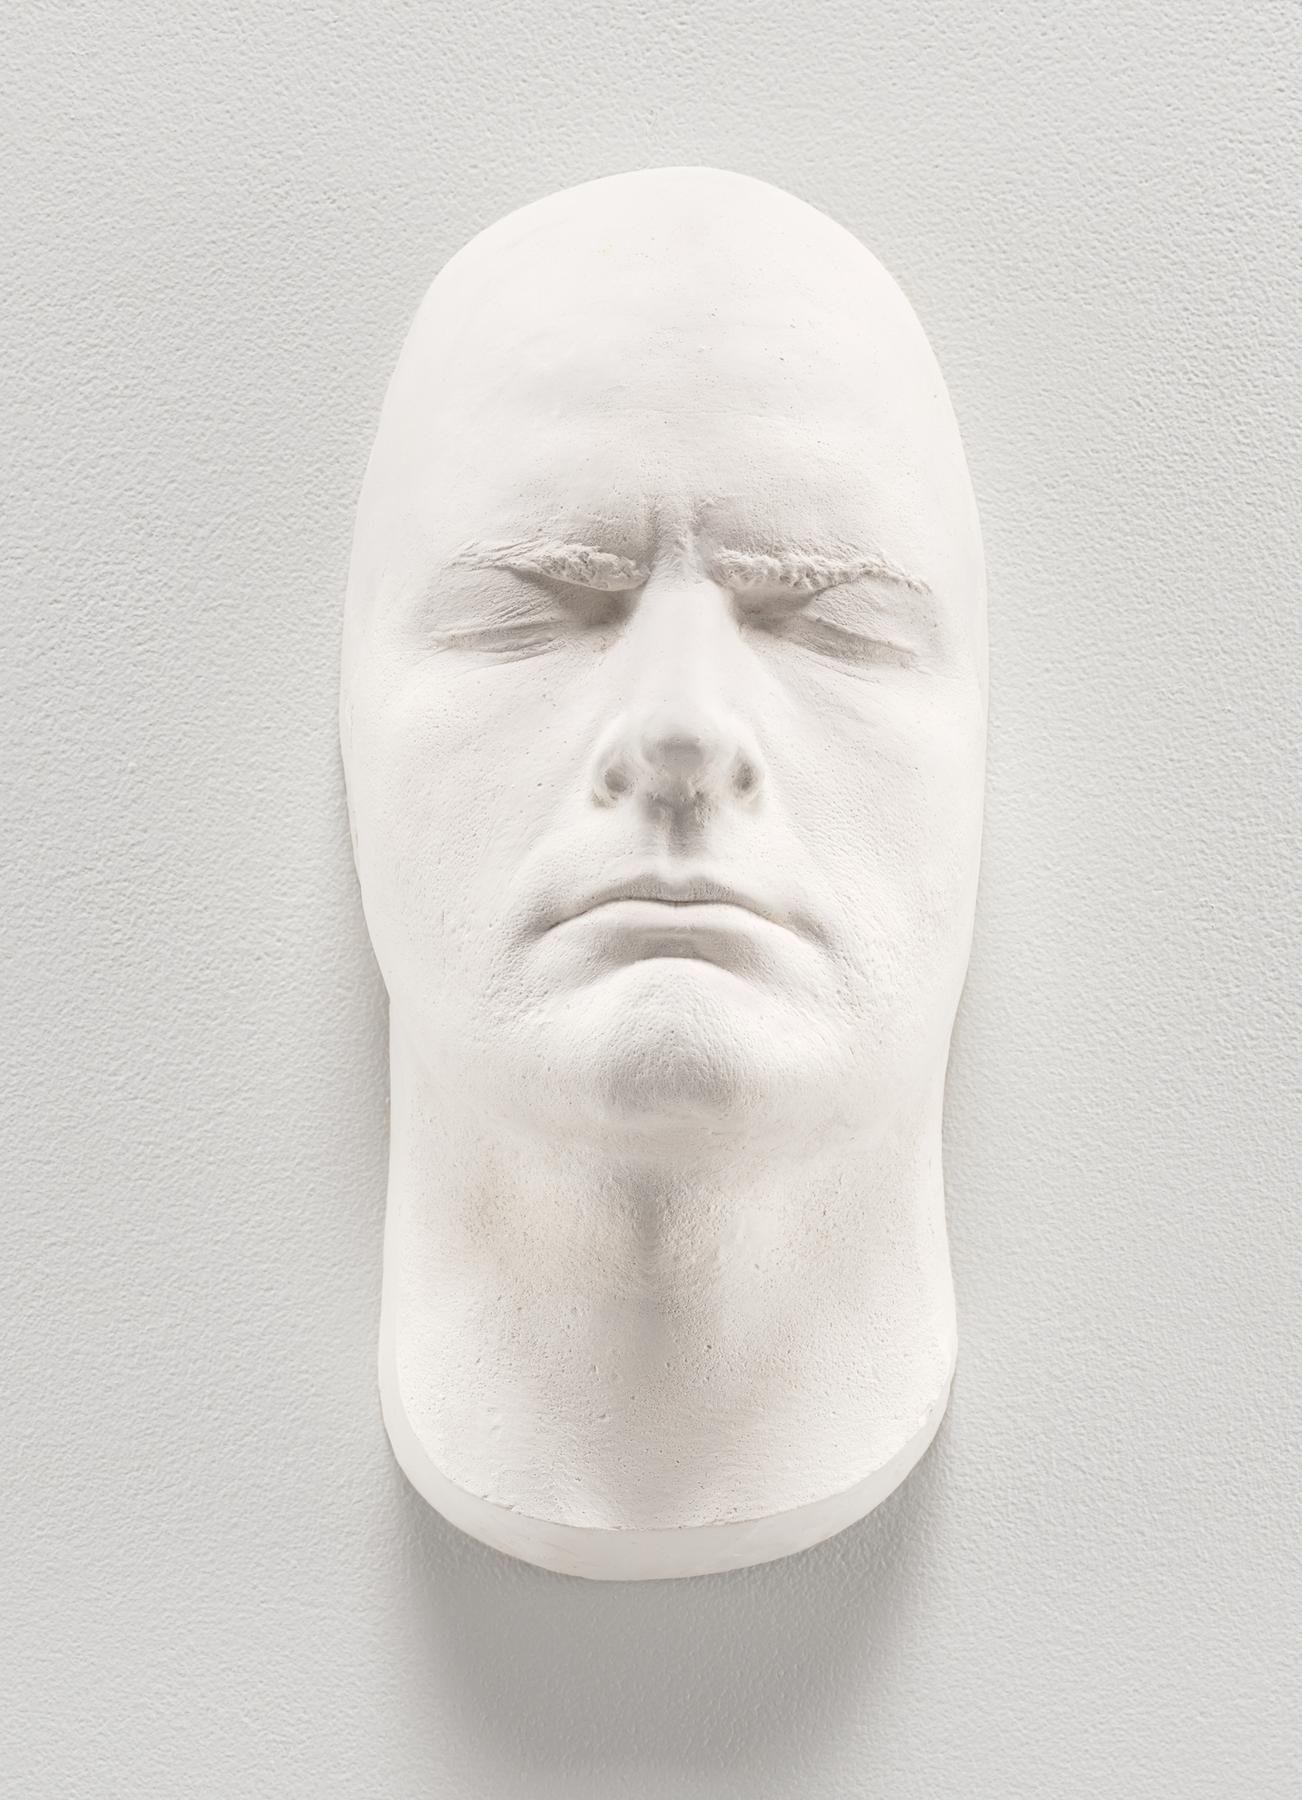 Edmier imagines (Charlie Sheen, Actor)